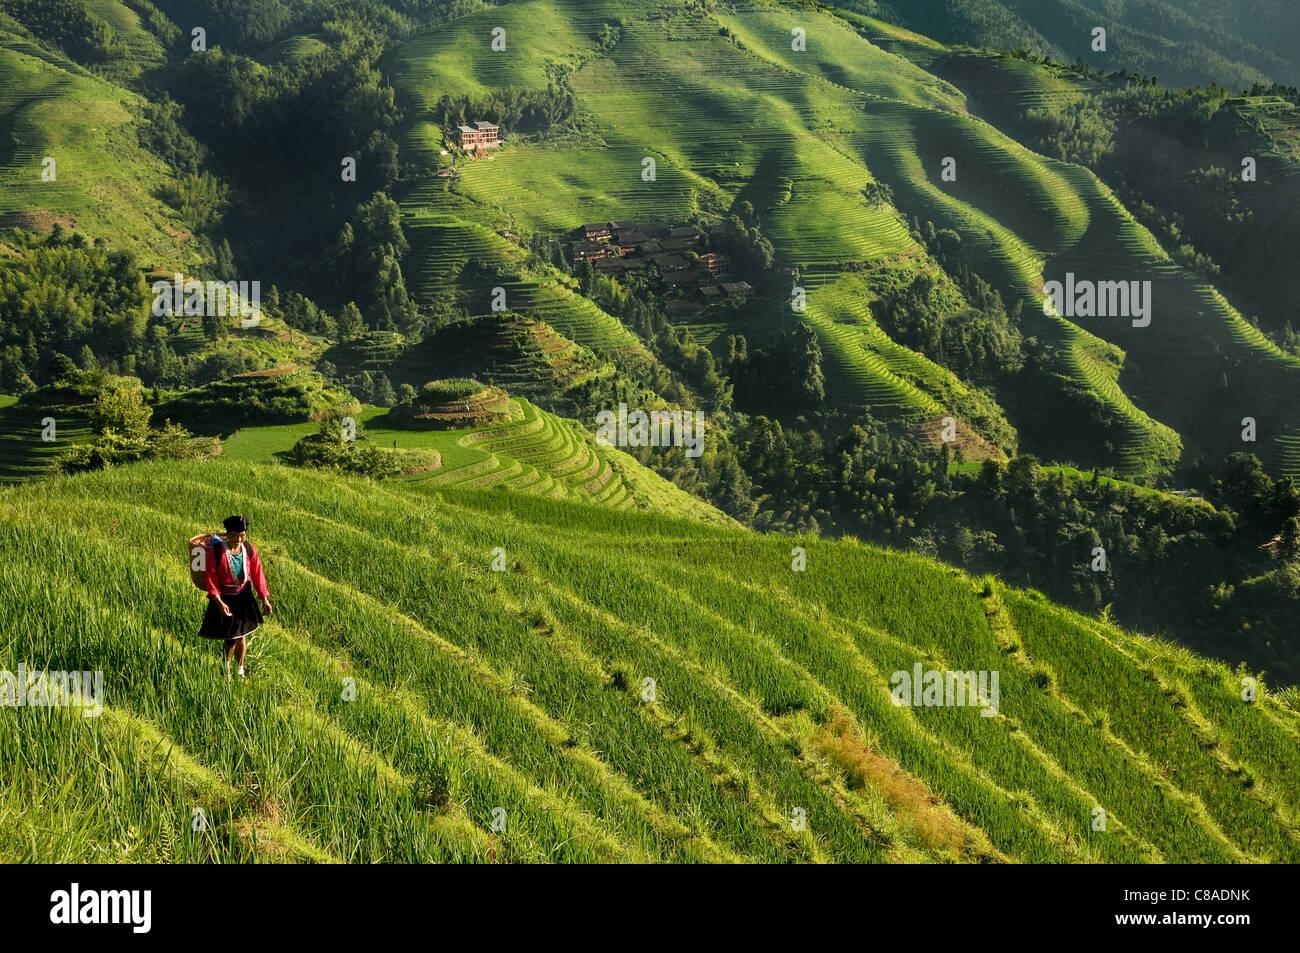 Local woman walking along the rice terraces in the dragon backbone terraces. - Stock Image